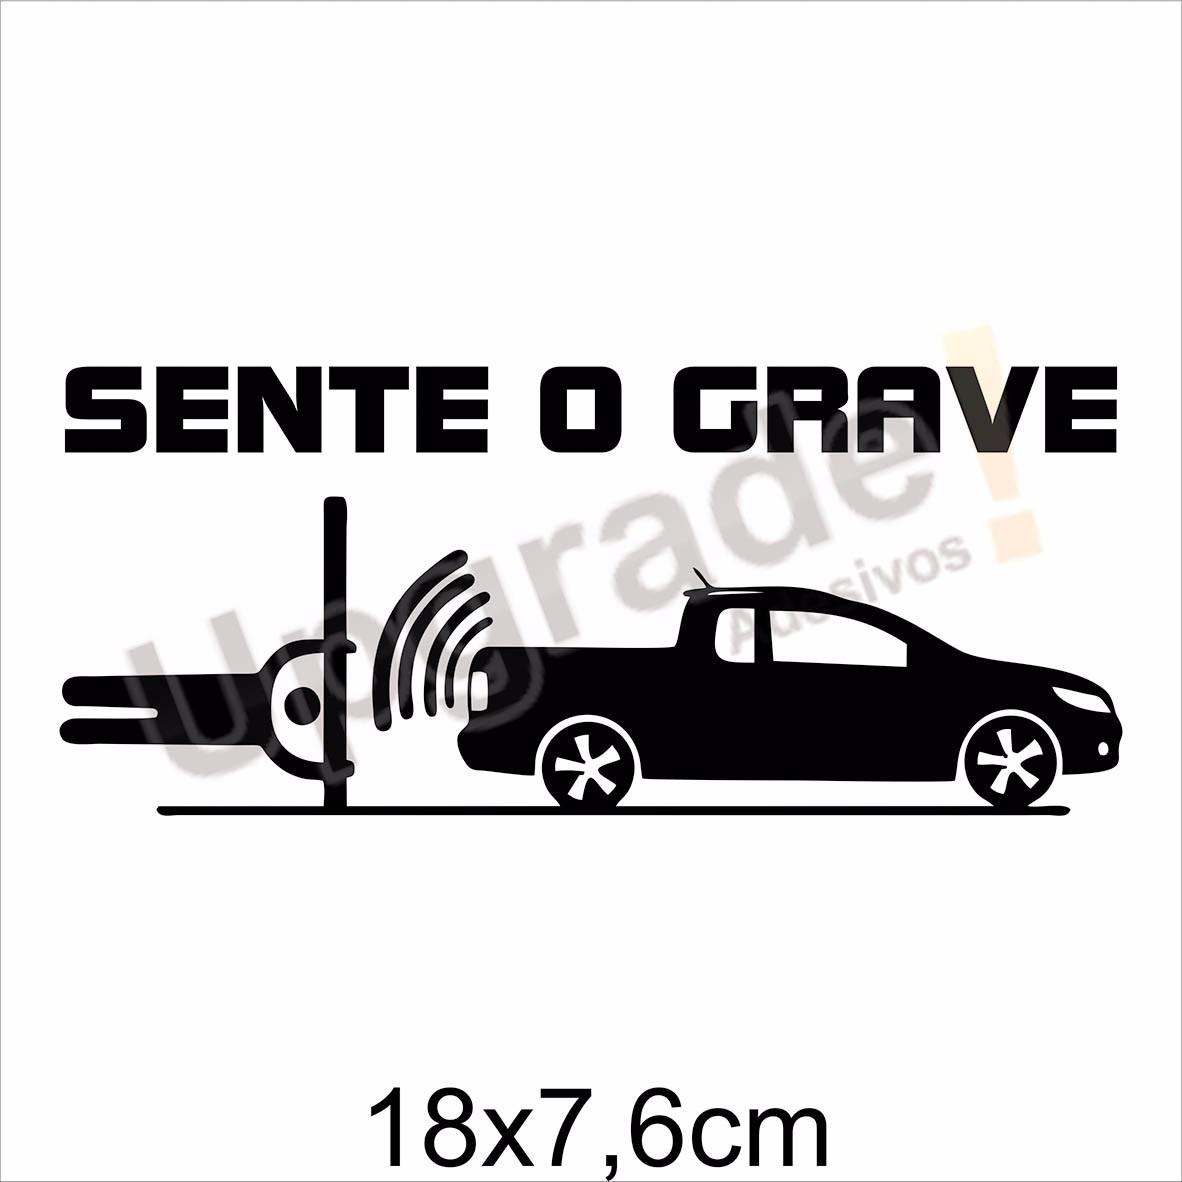 Adesivo Carro Rebaixado Sente O Grave Som Automotivo Alto R 12